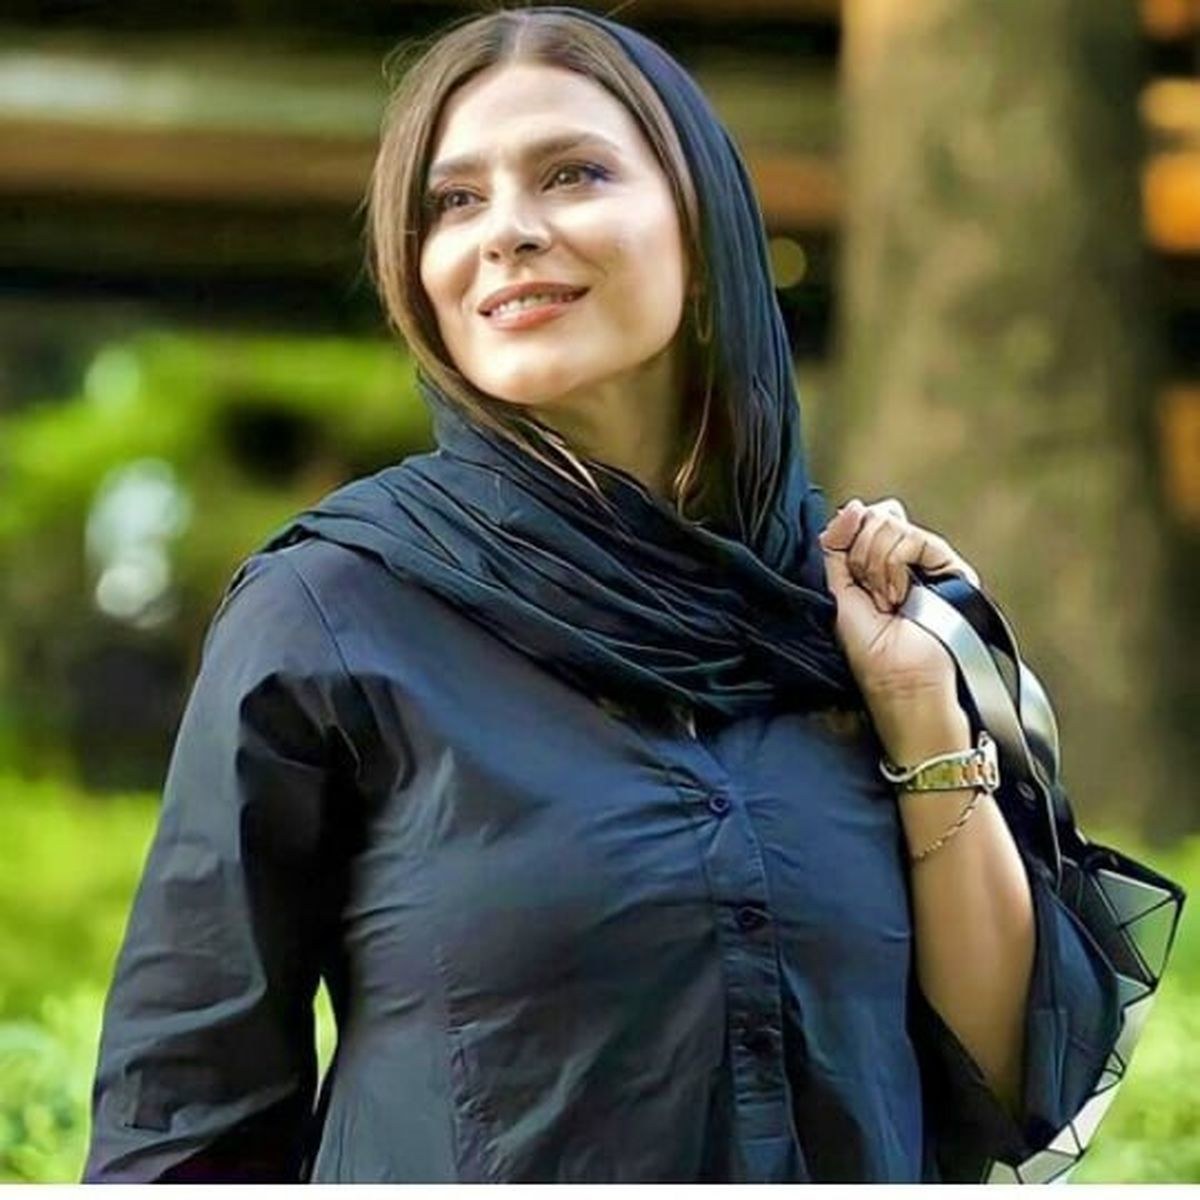 عکس سورپرایز جدید سحر دولتشاهی | عکس سحر دولتشاهی و همسرش